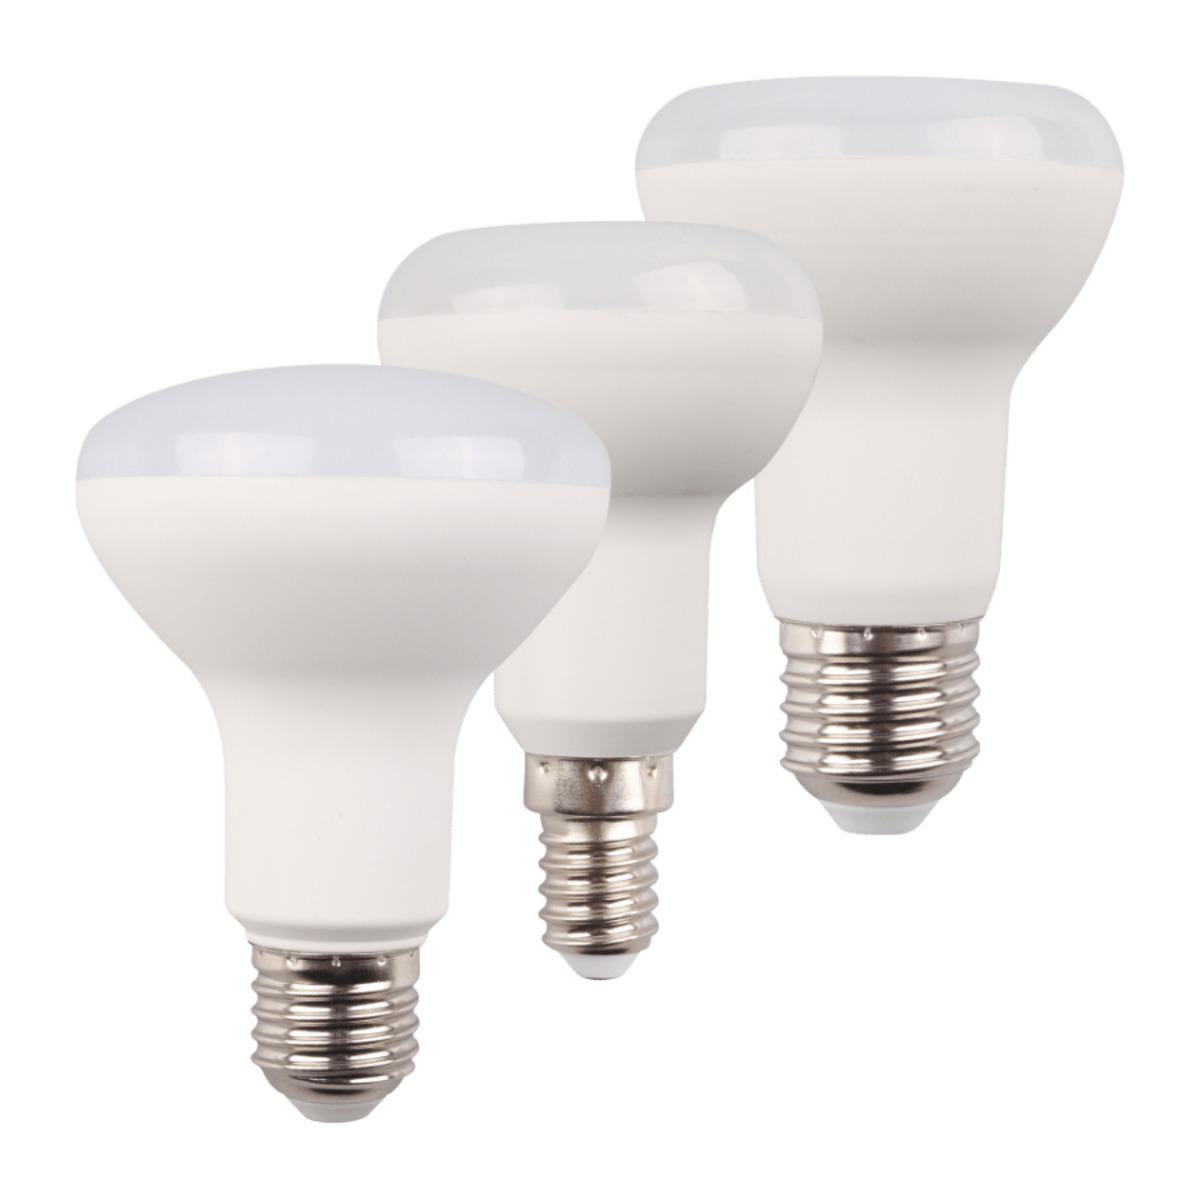 Bild 1 von LIGHTZONE     LED-Reflektor